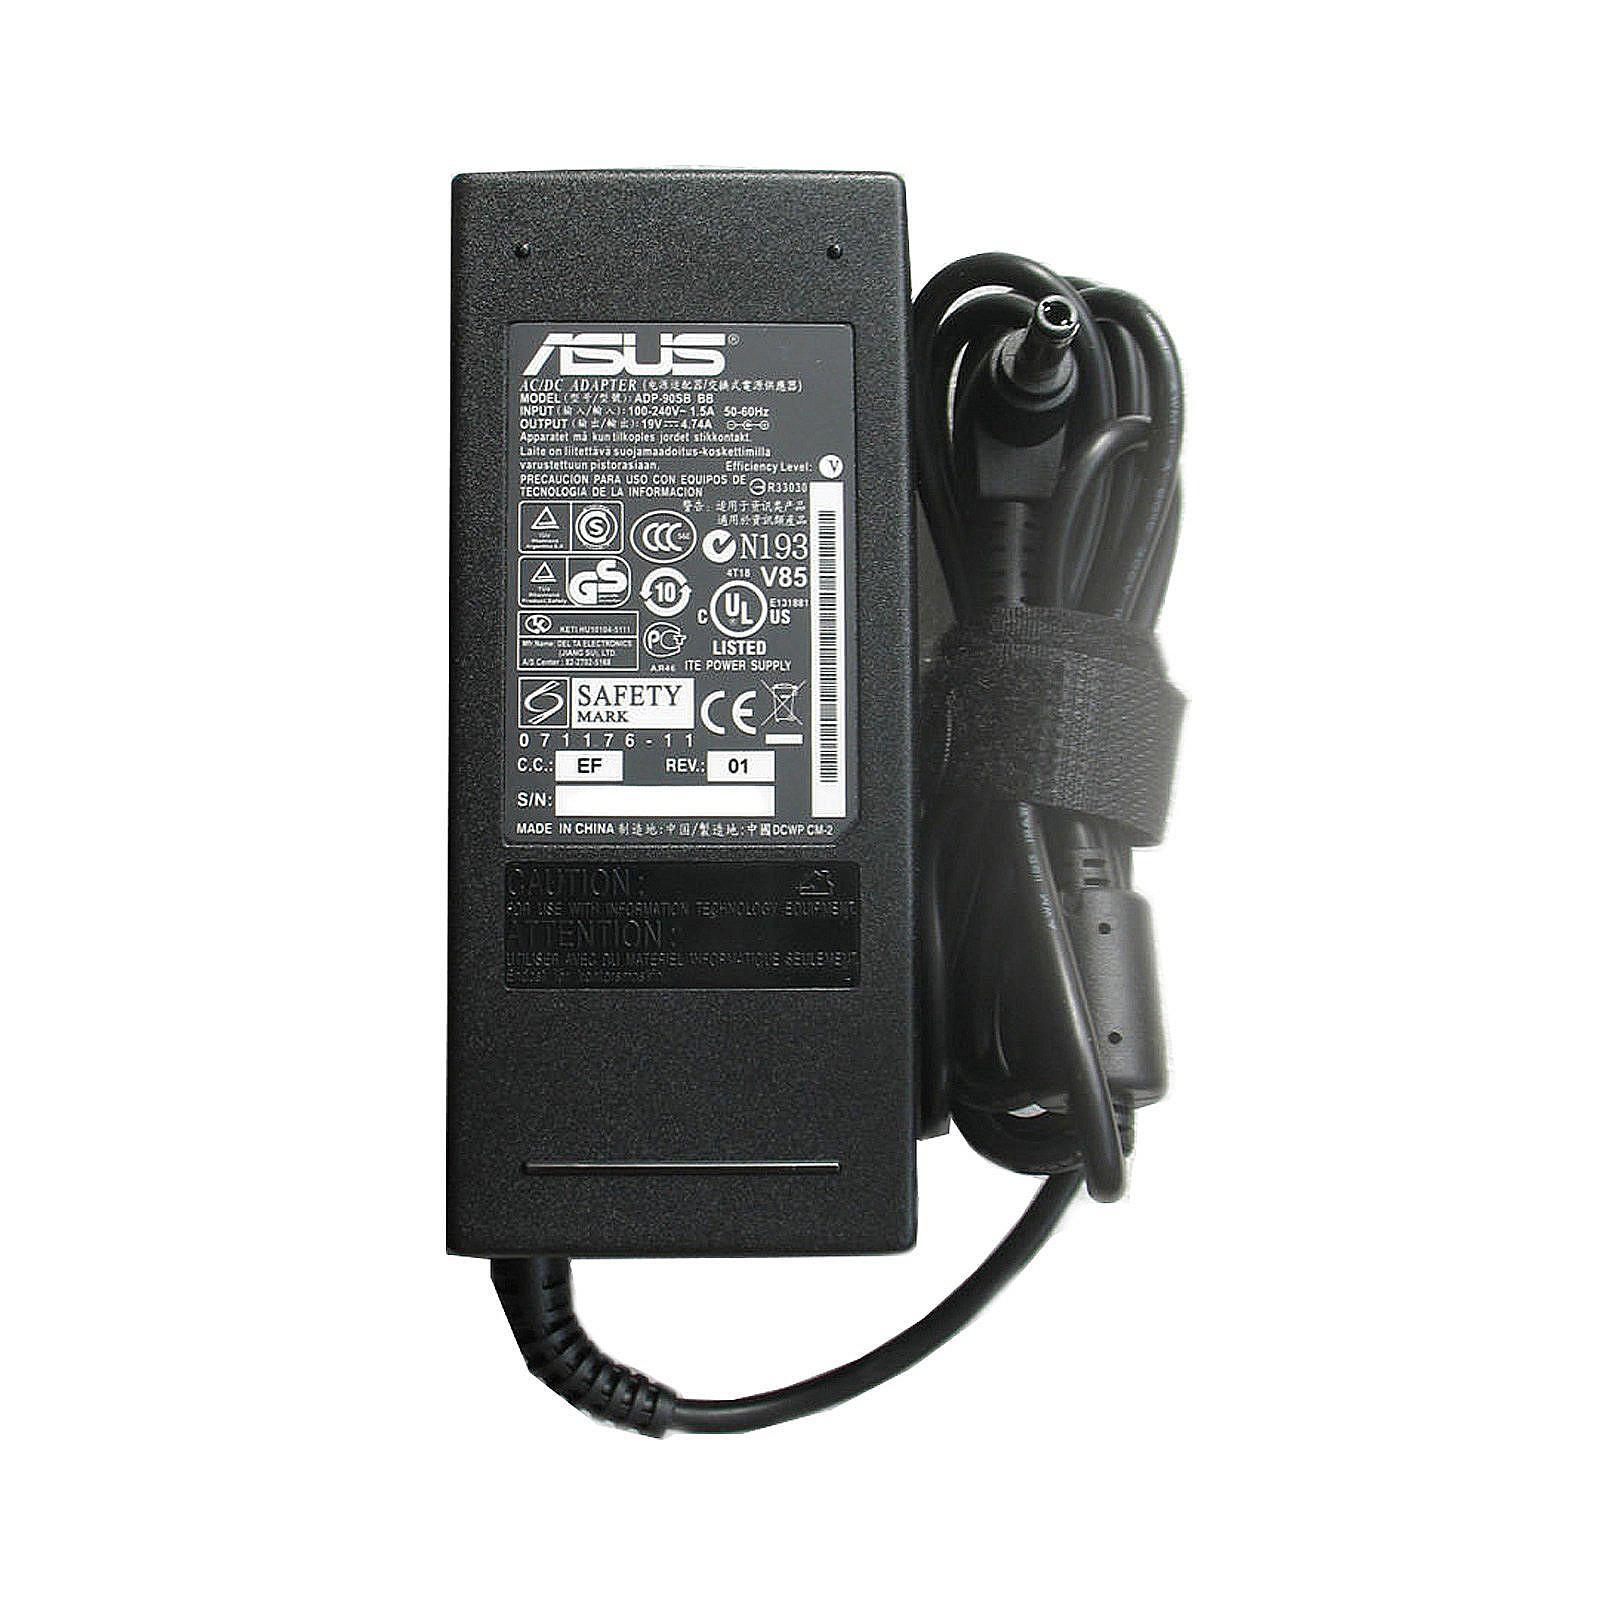 Блок питания к ноутбуку Grand-X Asus (19V 4.74A 90W) 5.5x2.5mm (GRXAS90W)